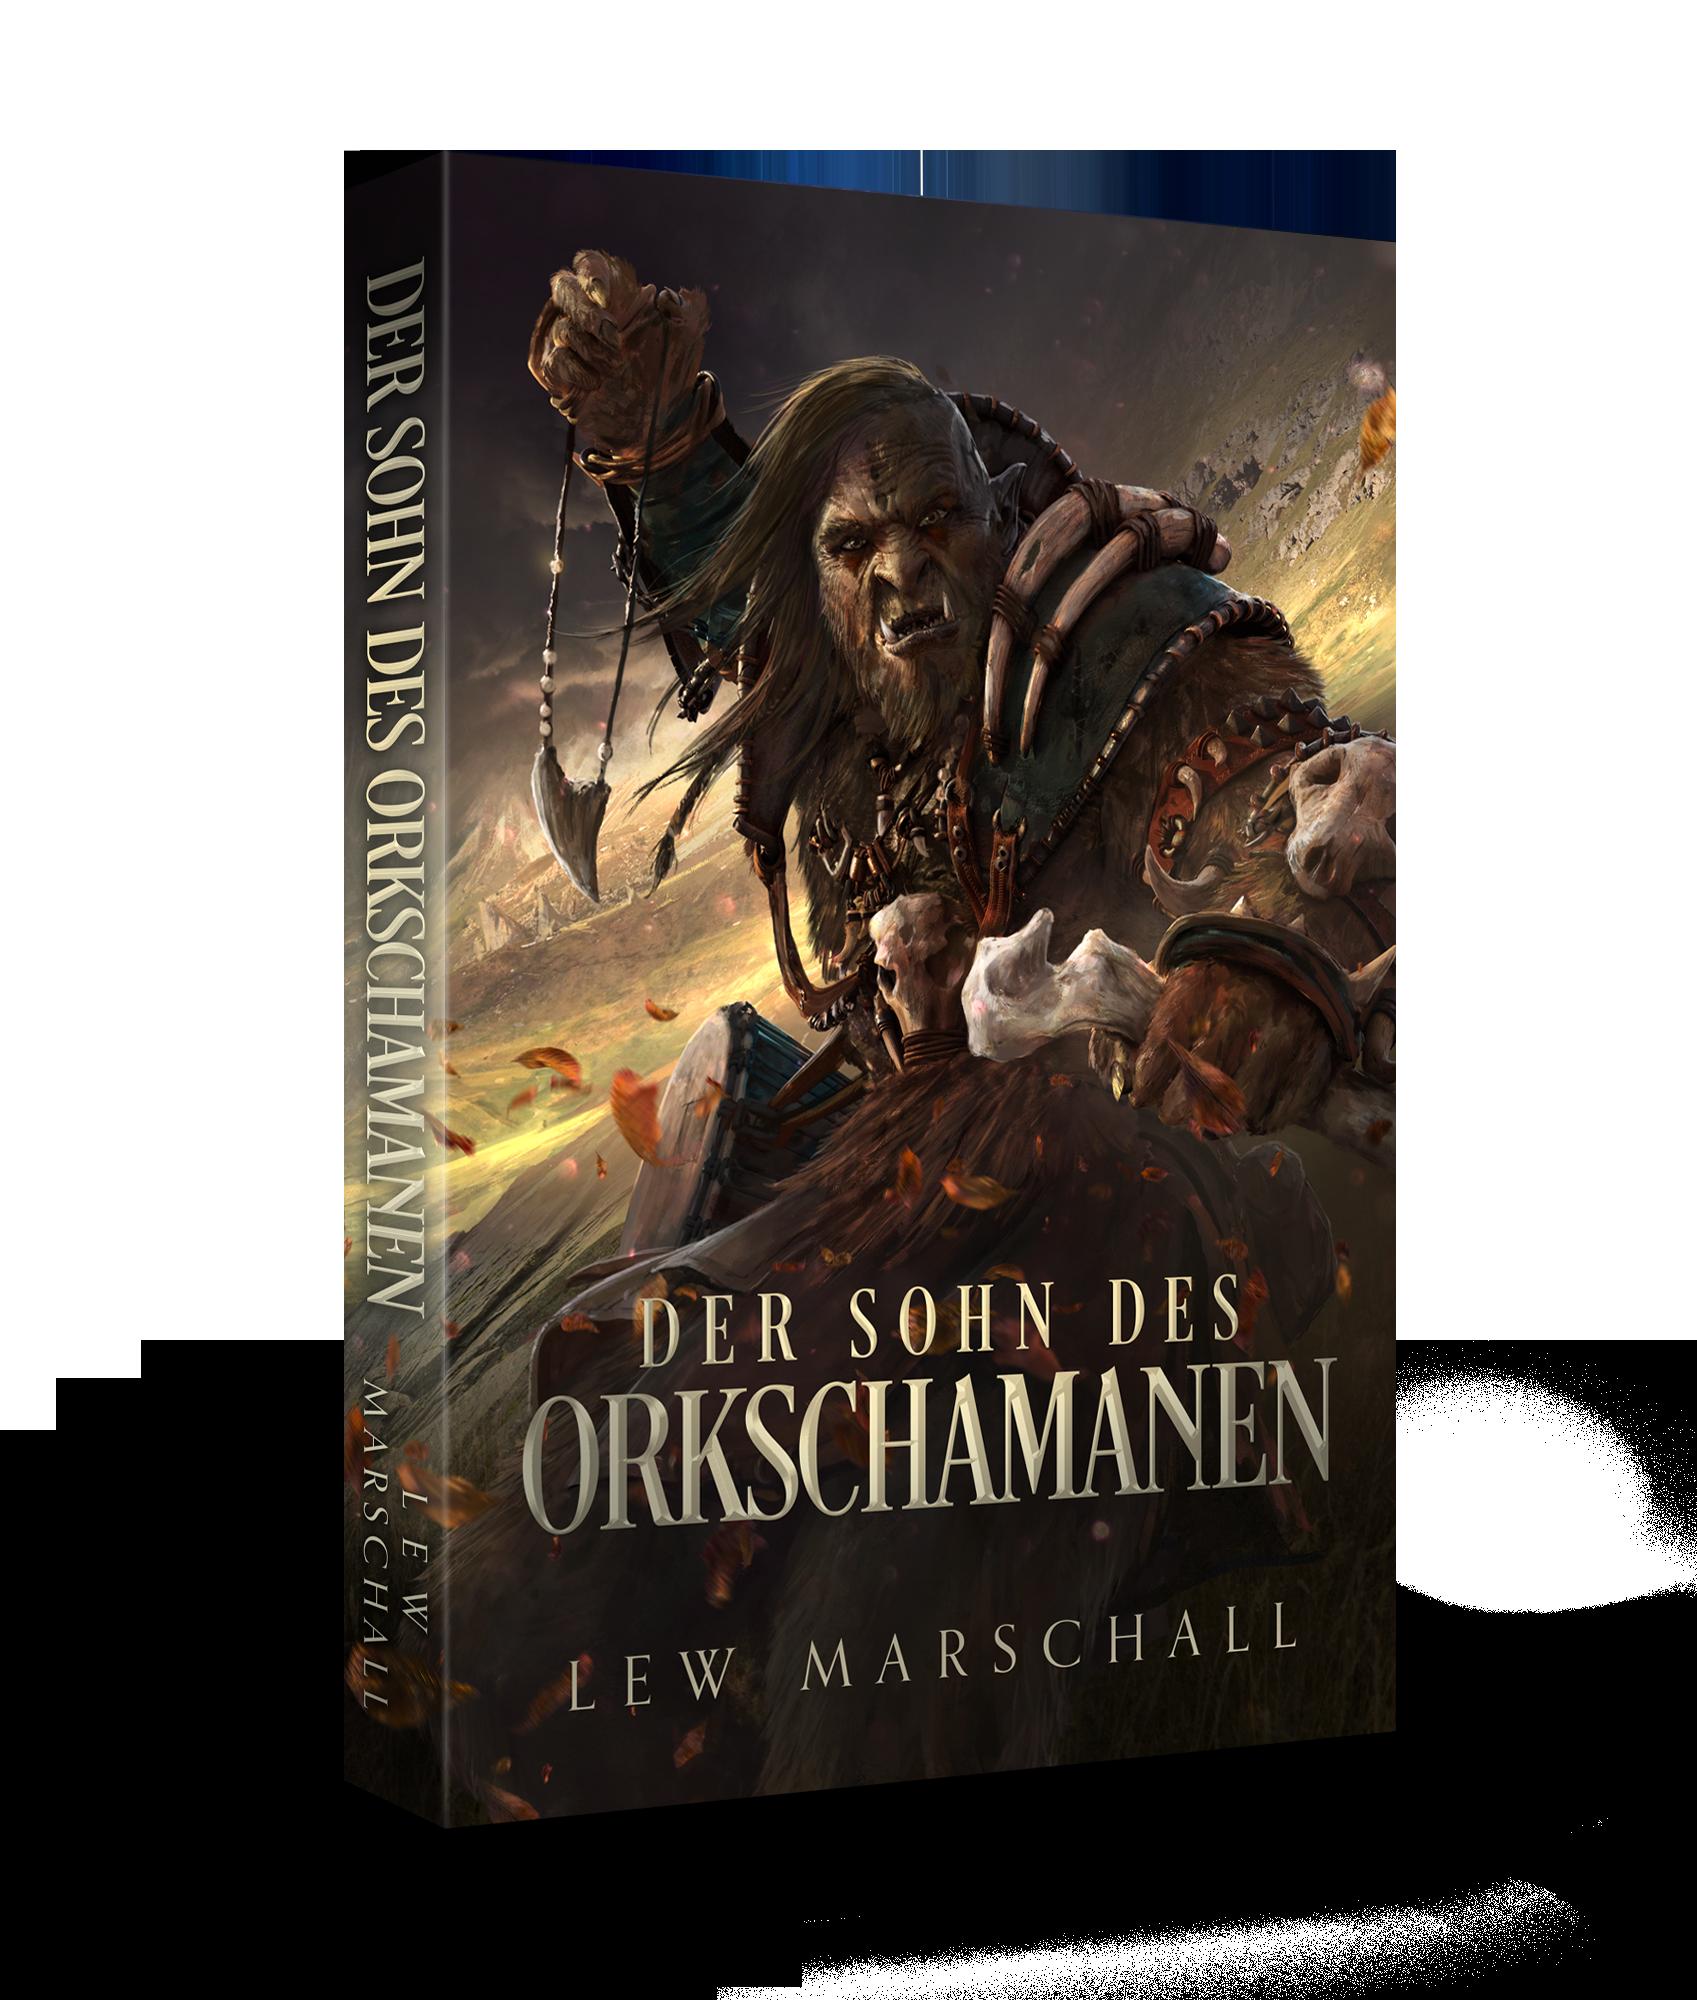 Lew Marschall